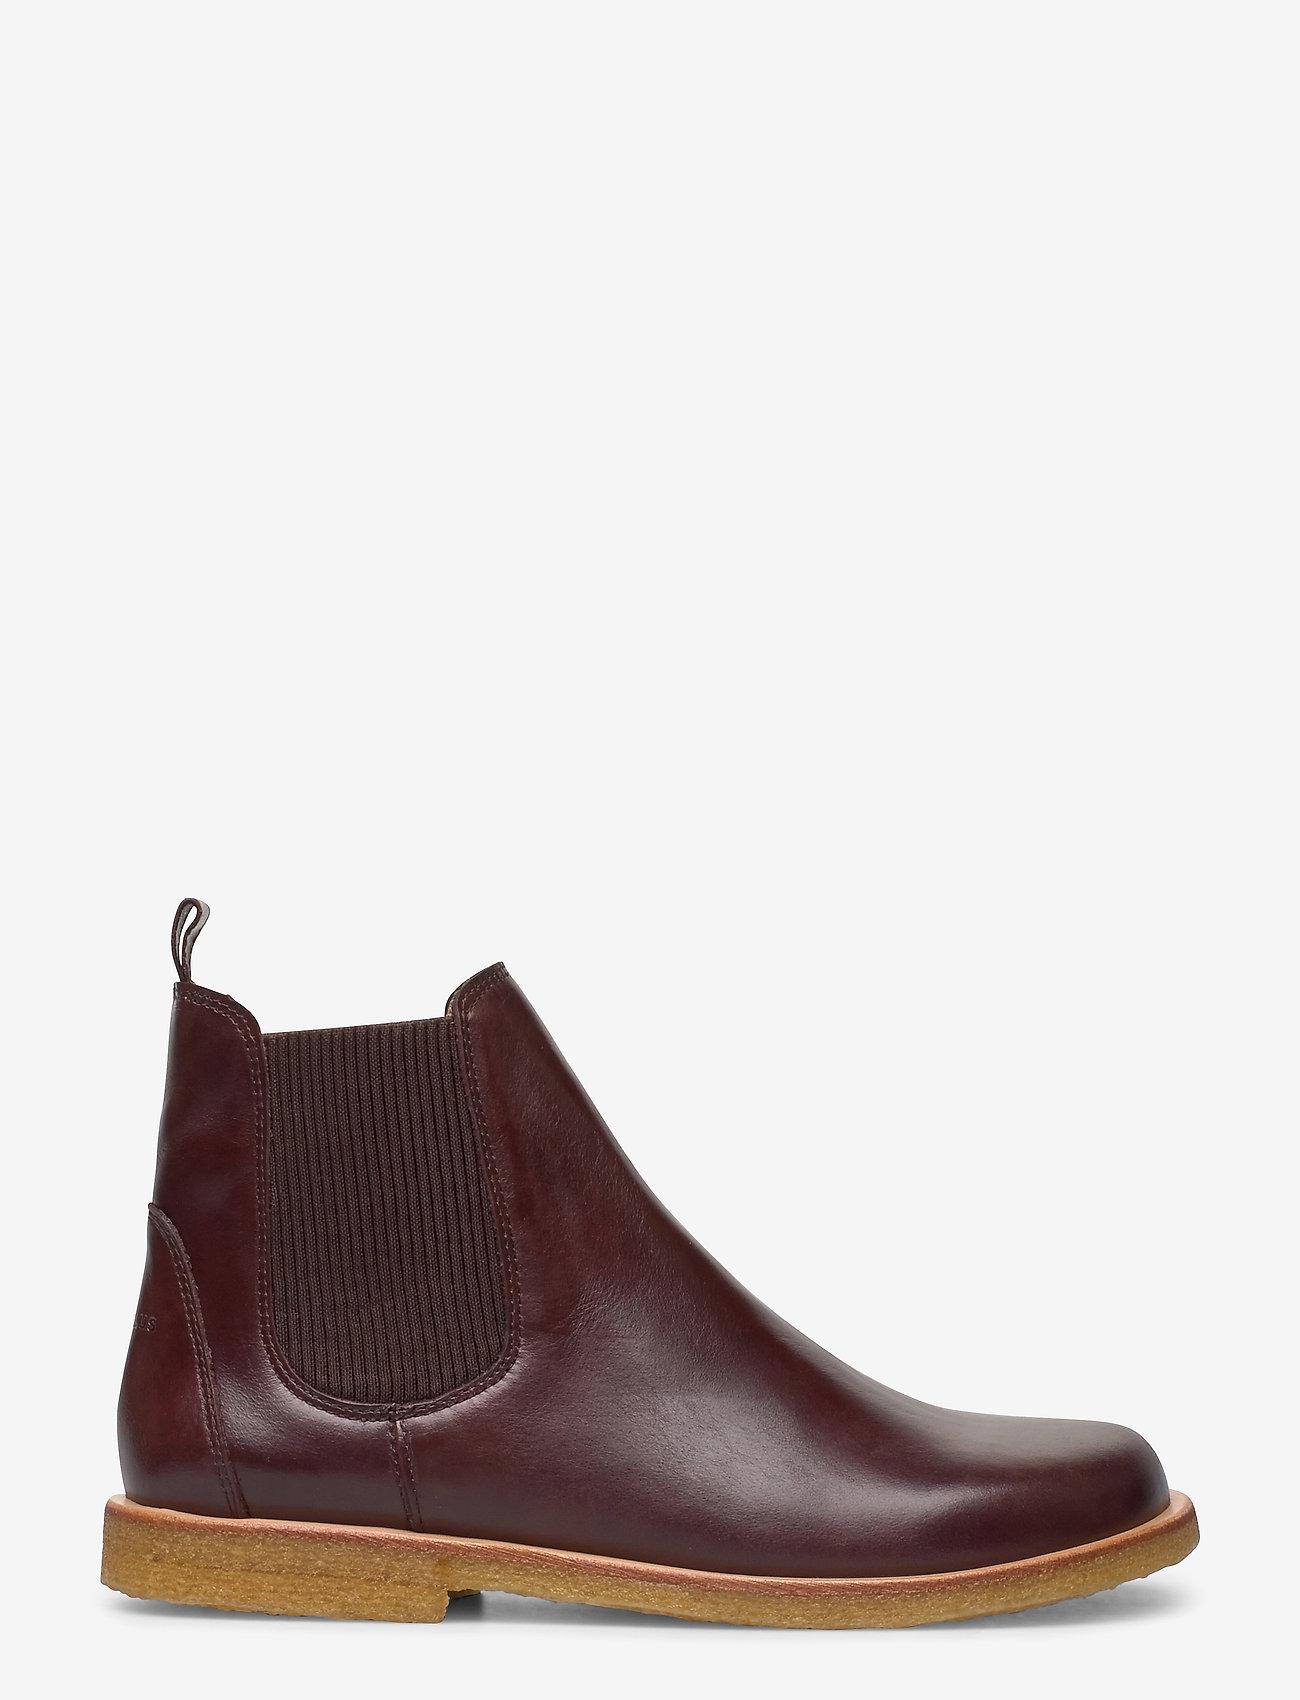 ANGULUS - Booties-flat - with elastic - chelsea boots - 1836/046 dark brown/d. brown - 1